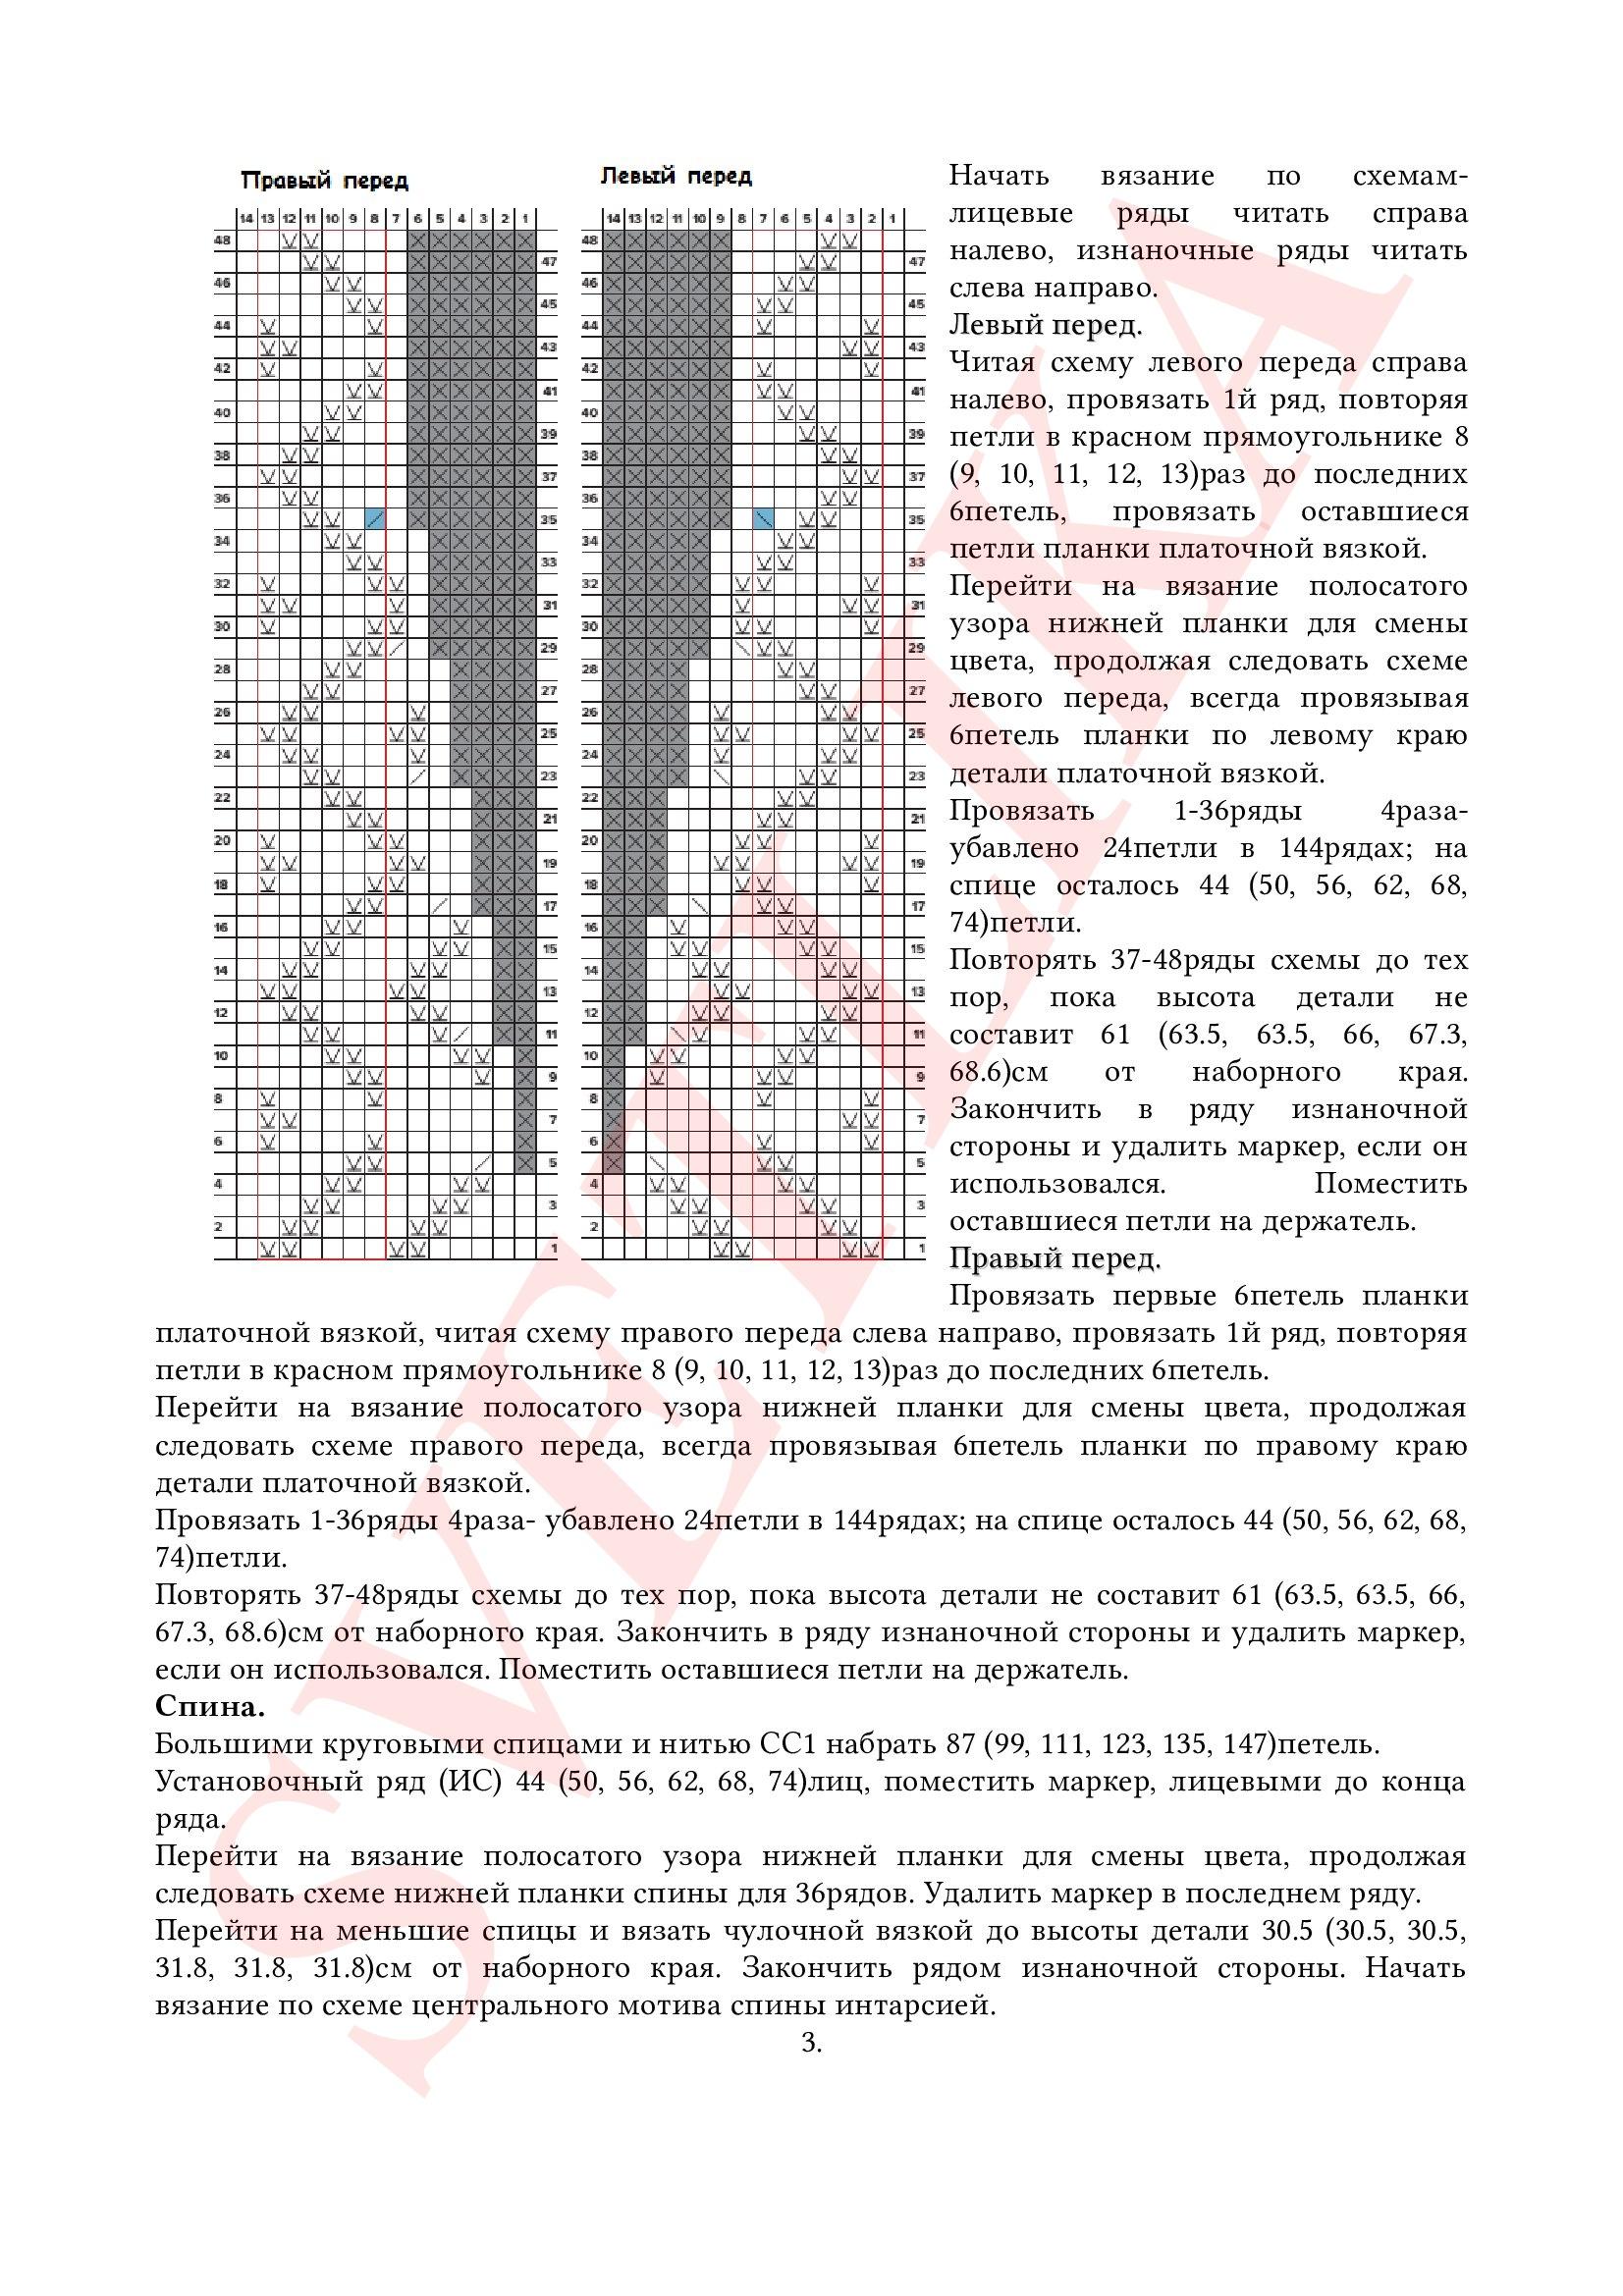 https://img-fotki.yandex.ru/get/195431/125862467.aa/0_1bcb3d_1206bd89_orig